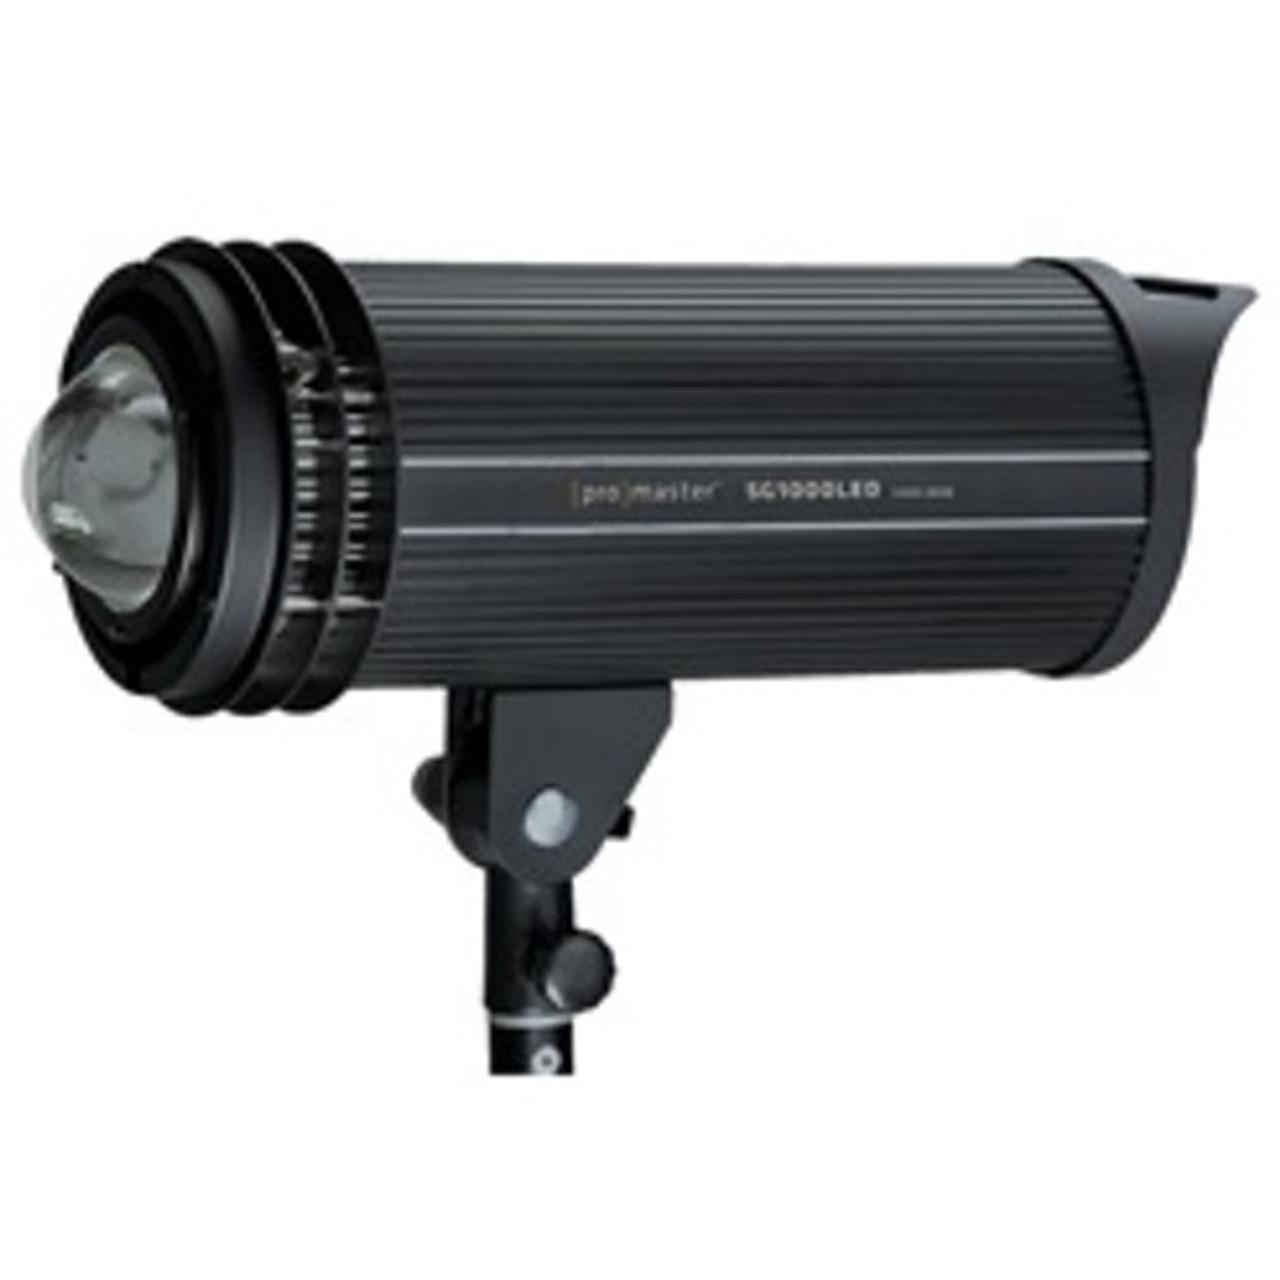 Promaster SG1000 Remote LED Studio Light